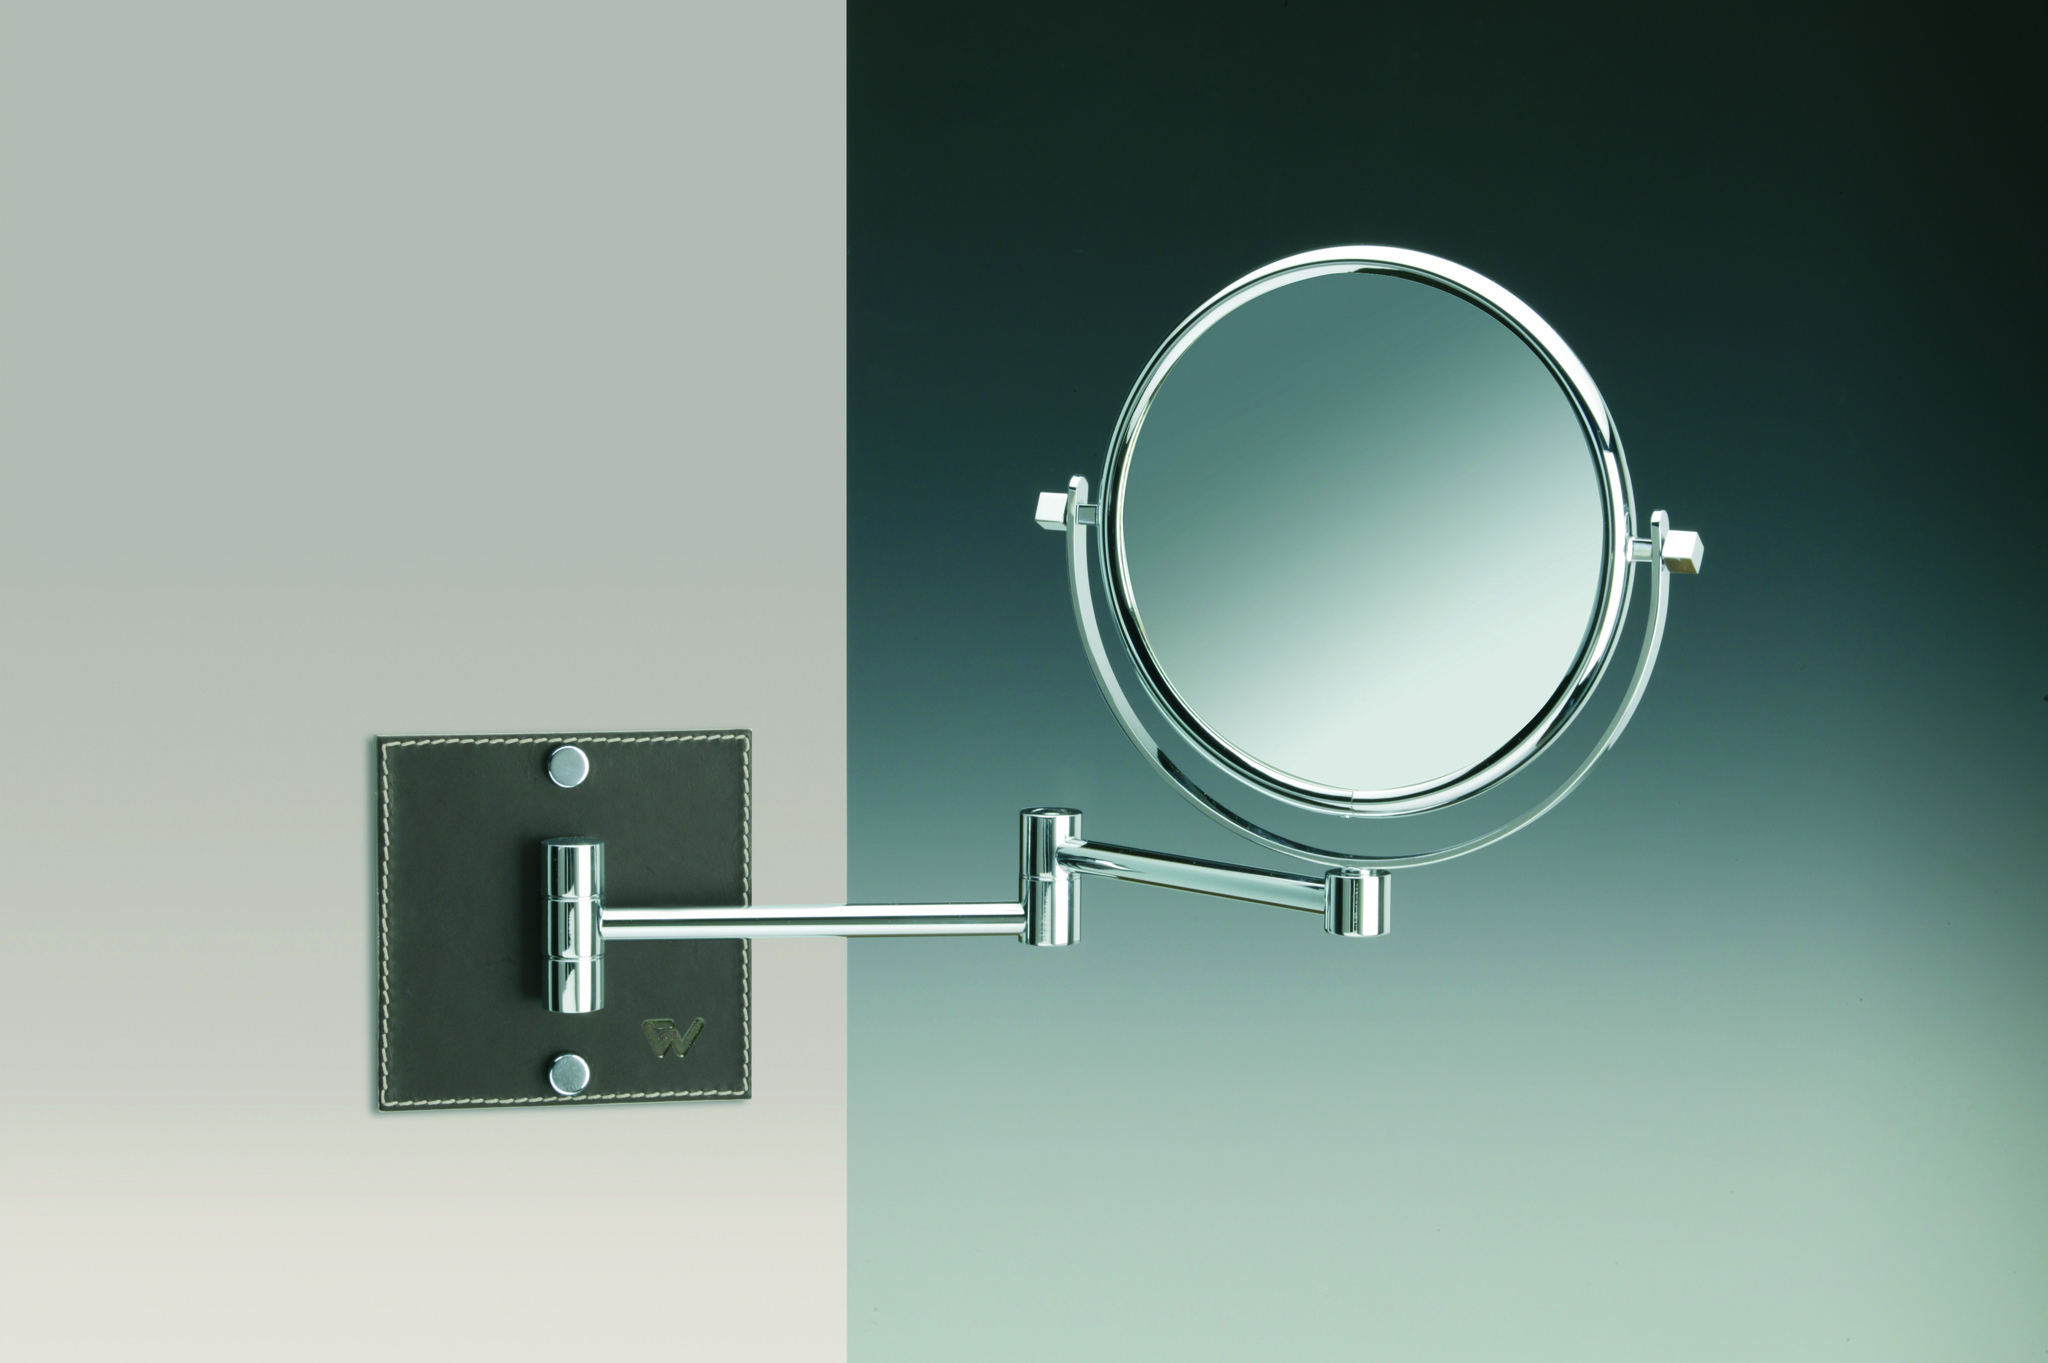 Зеркала Зеркало косметическое Windisch 99337R 5XOP Kenia elitnoe-zerkalo-kosmeticheskoe-99337-kenia-ot-windisch-ispaniya.jpg